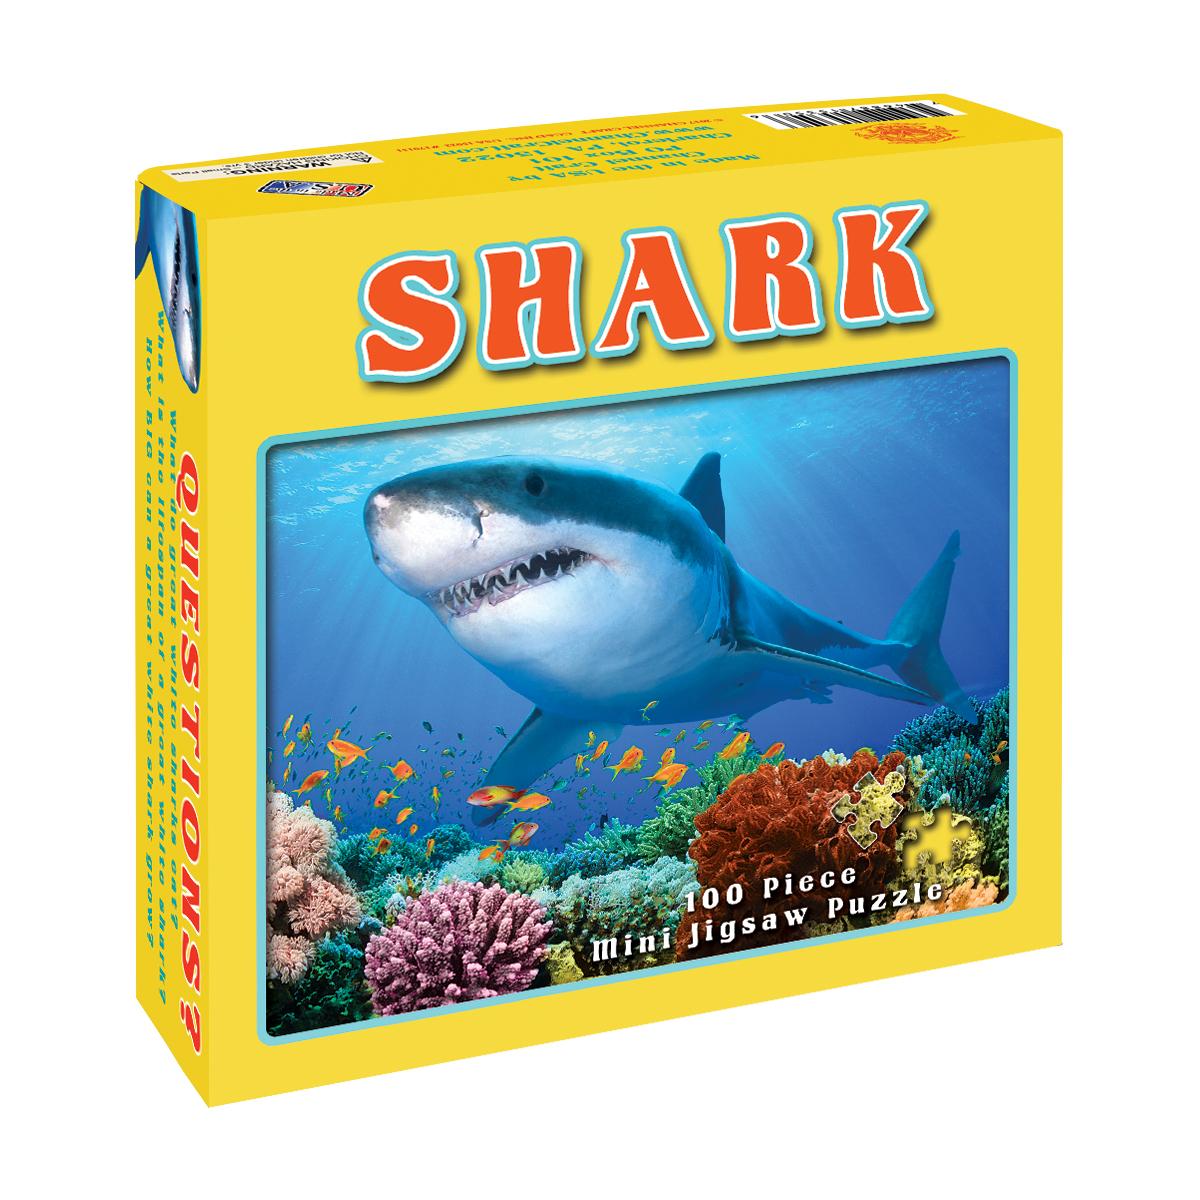 Shark (Mini) Under The Sea Jigsaw Puzzle